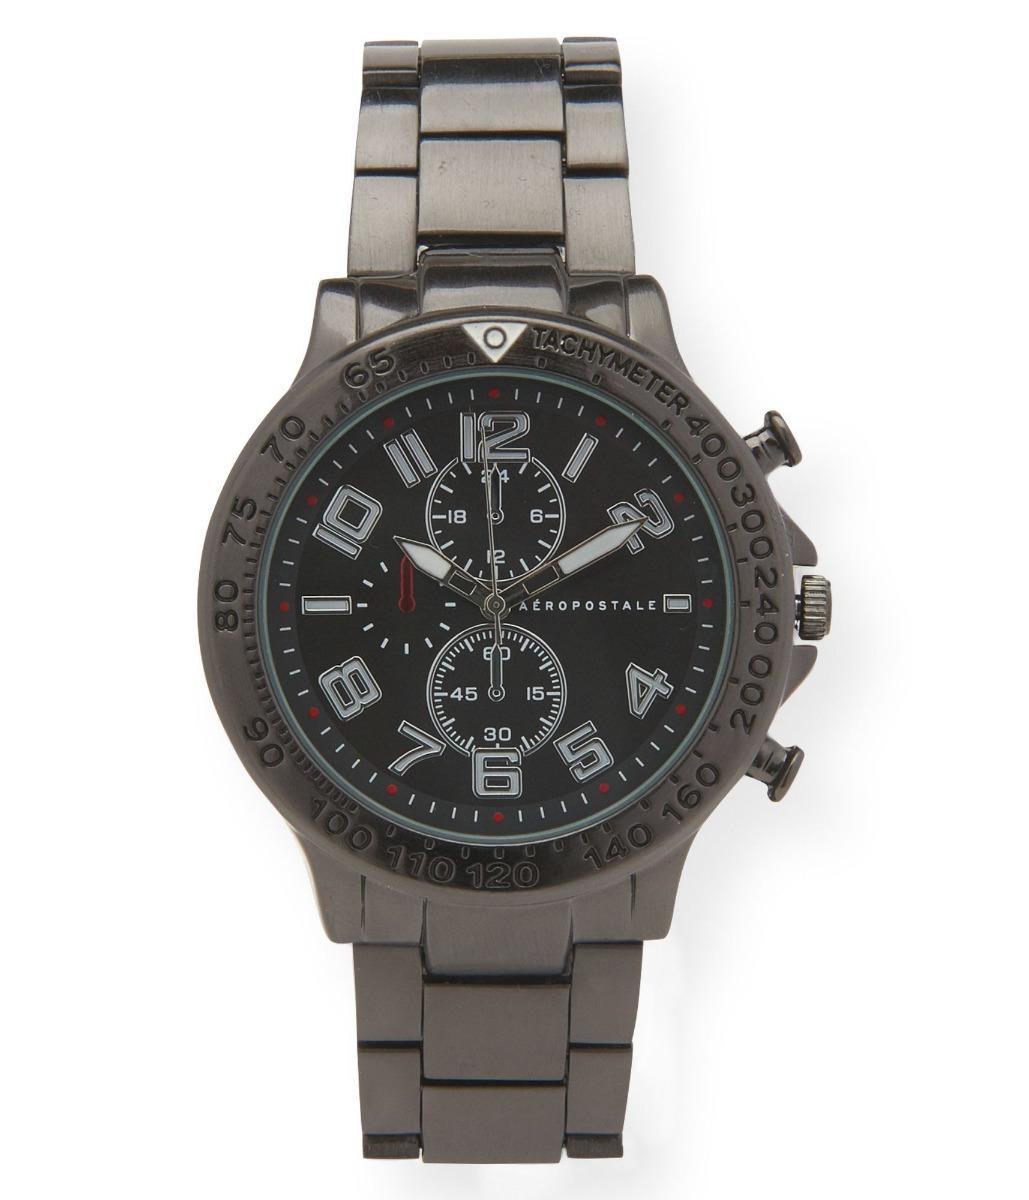 cfdb3abb432 relógio masculino aéropostale preto. Carregando zoom.